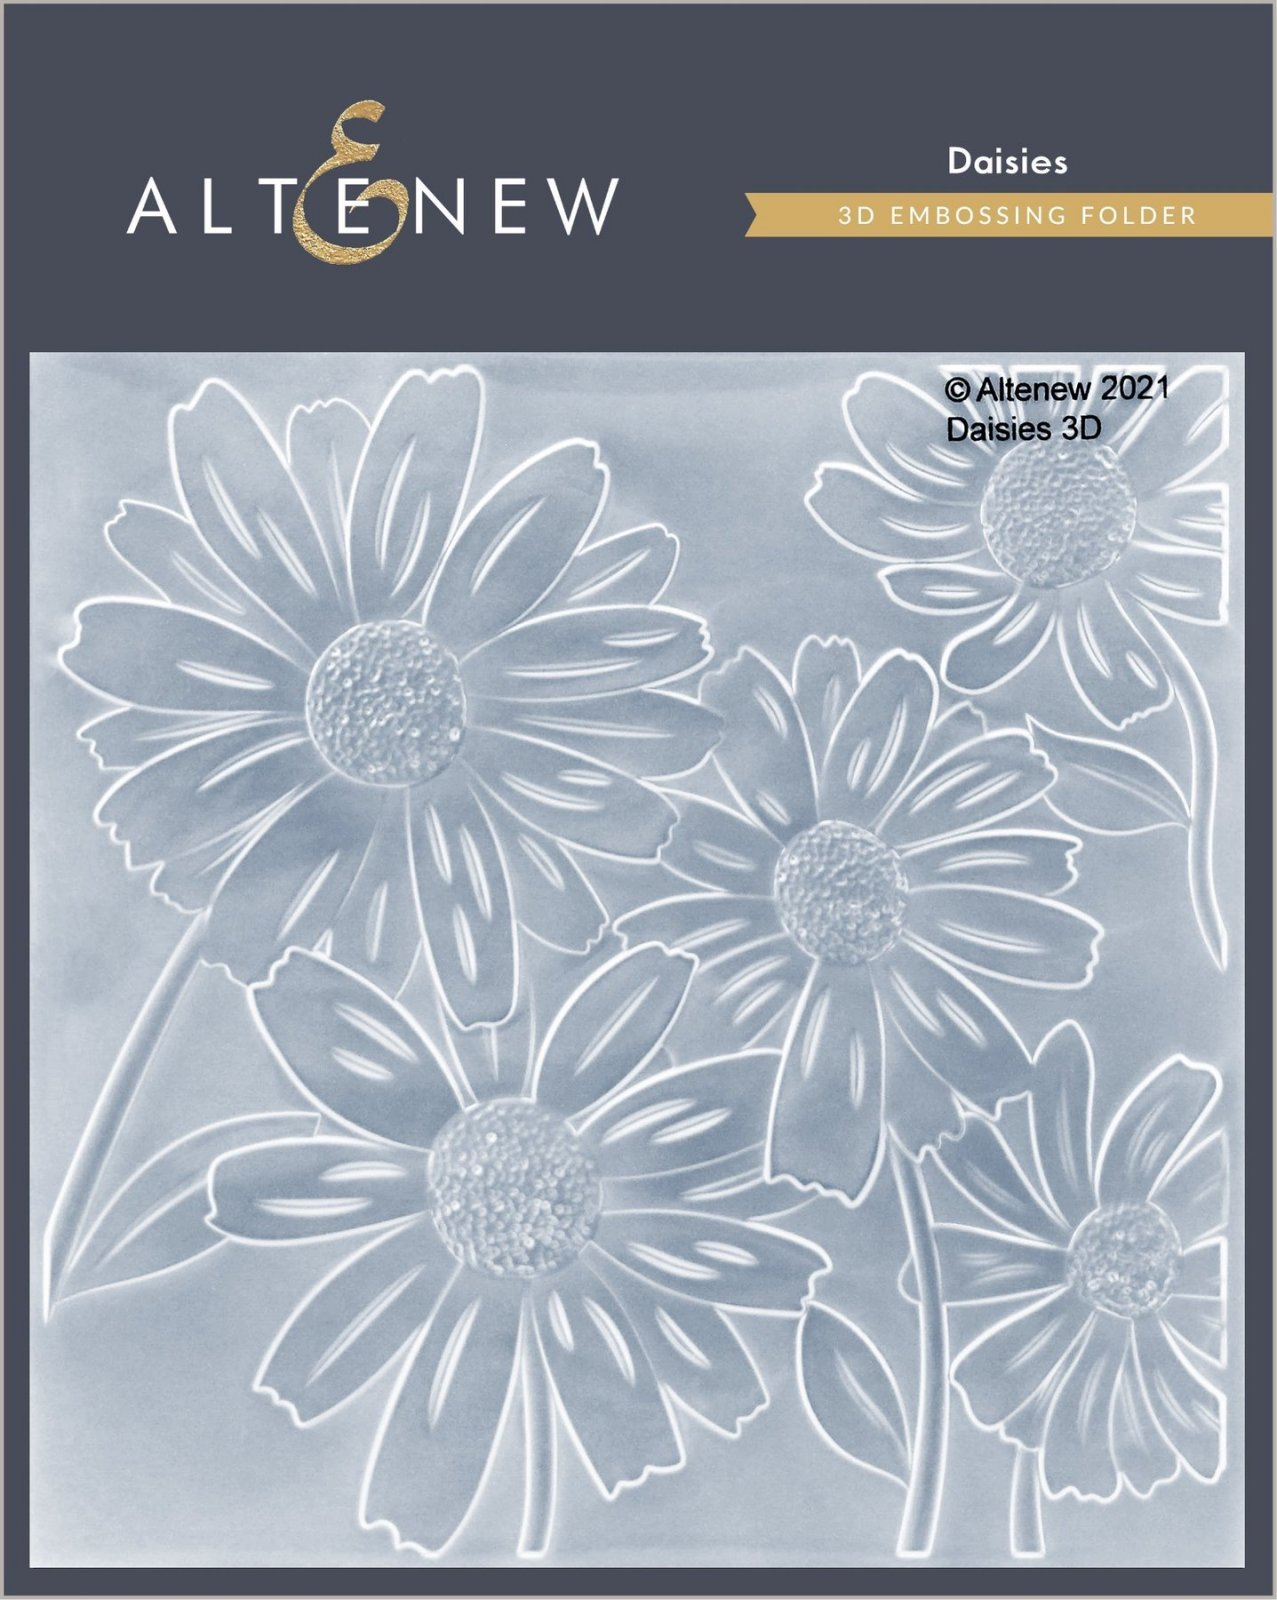 Altenew - Daisies 3D Embossing Folder